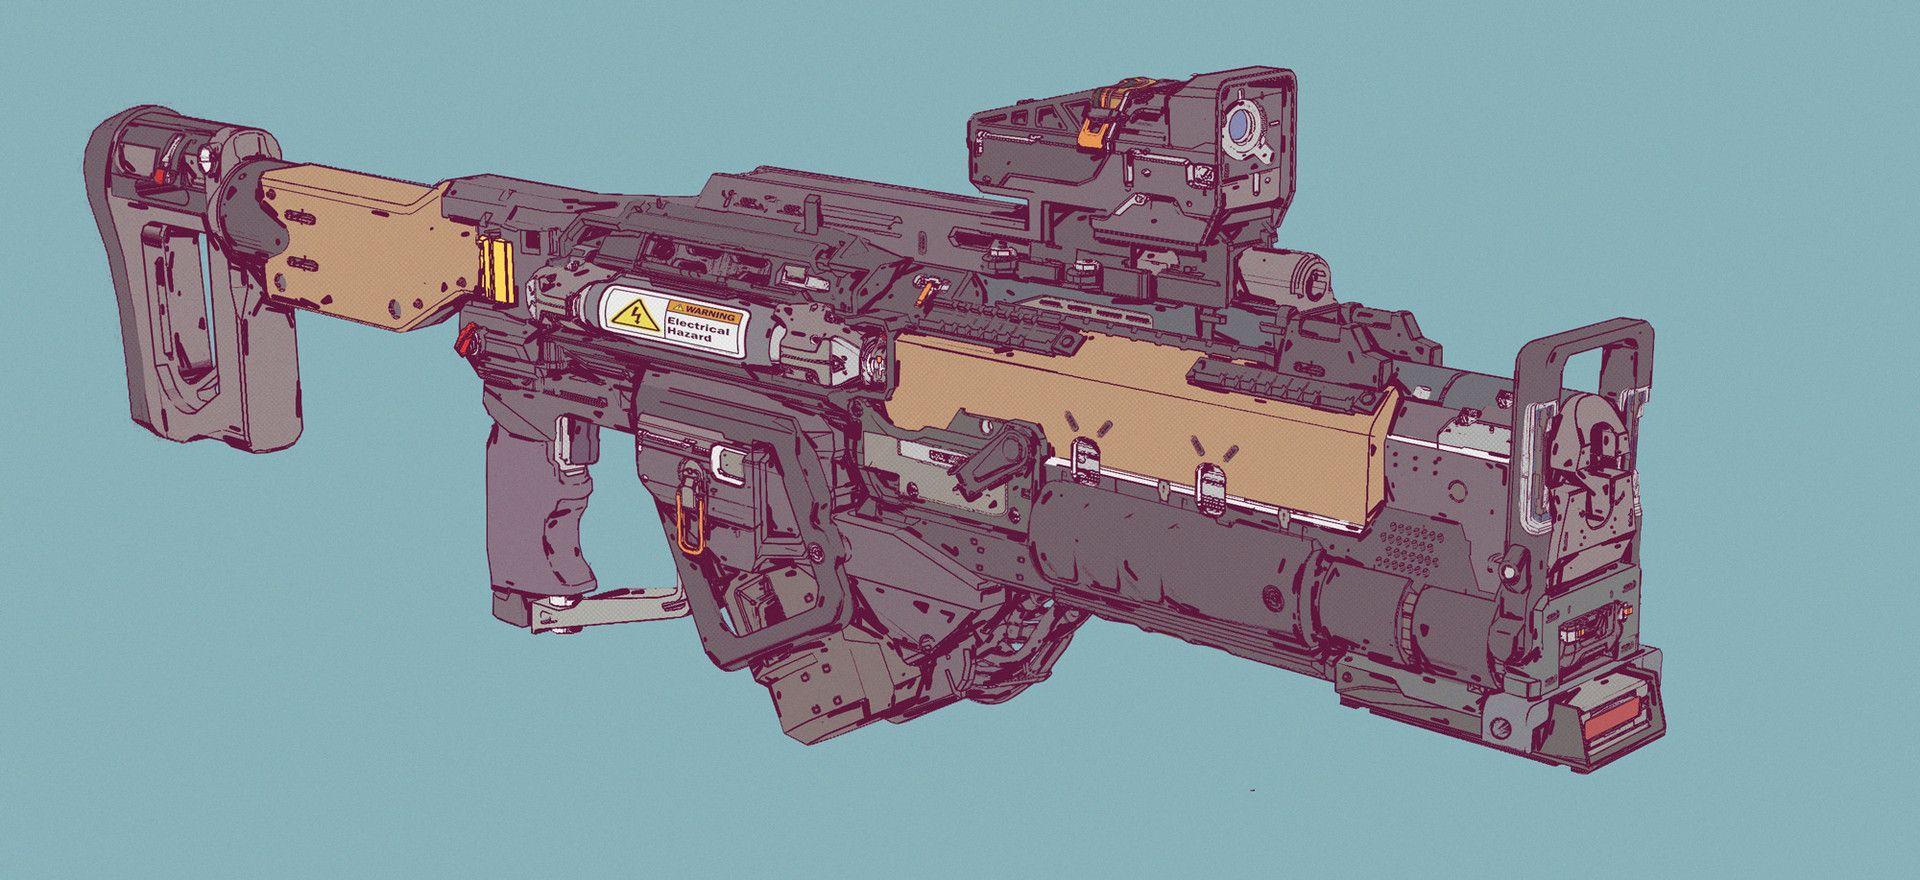 ArtStation - Gun Run_16, Elijah McNeal